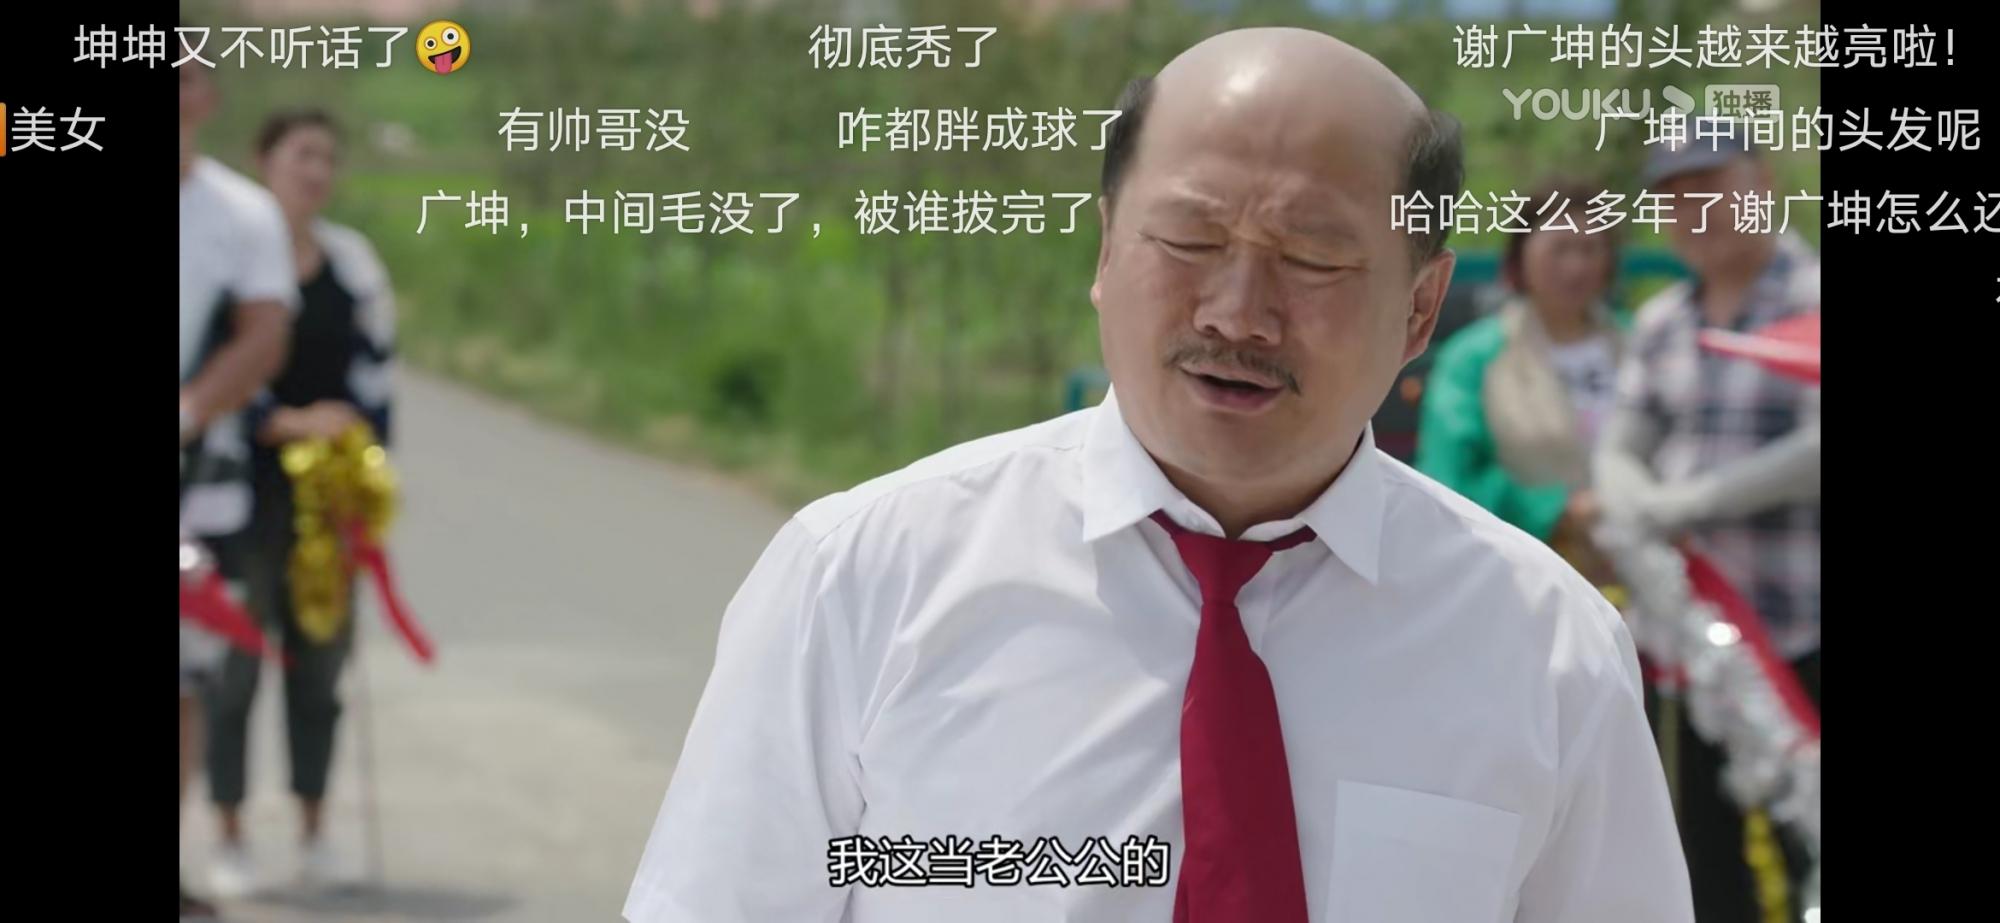 Screenshot_20200117_035355_com.huawei.himovie.jpg